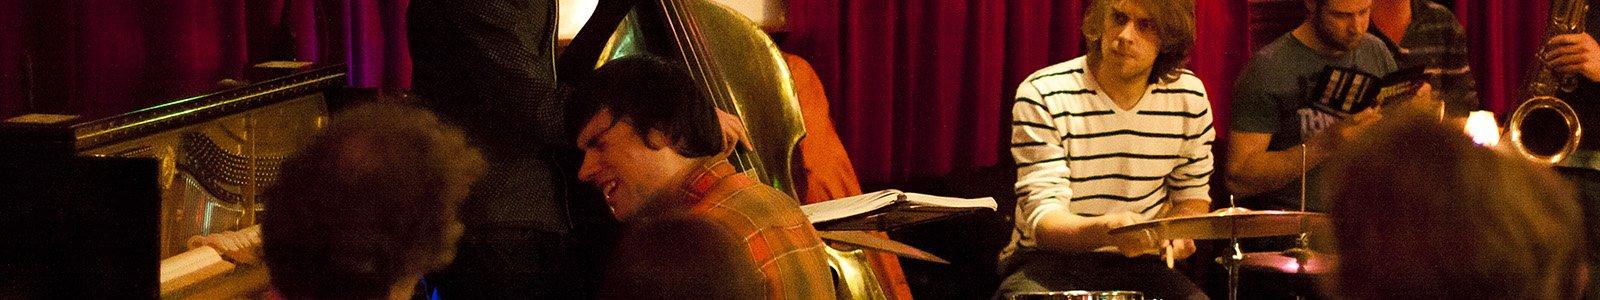 Muziekpodium foto: Joris Jehle